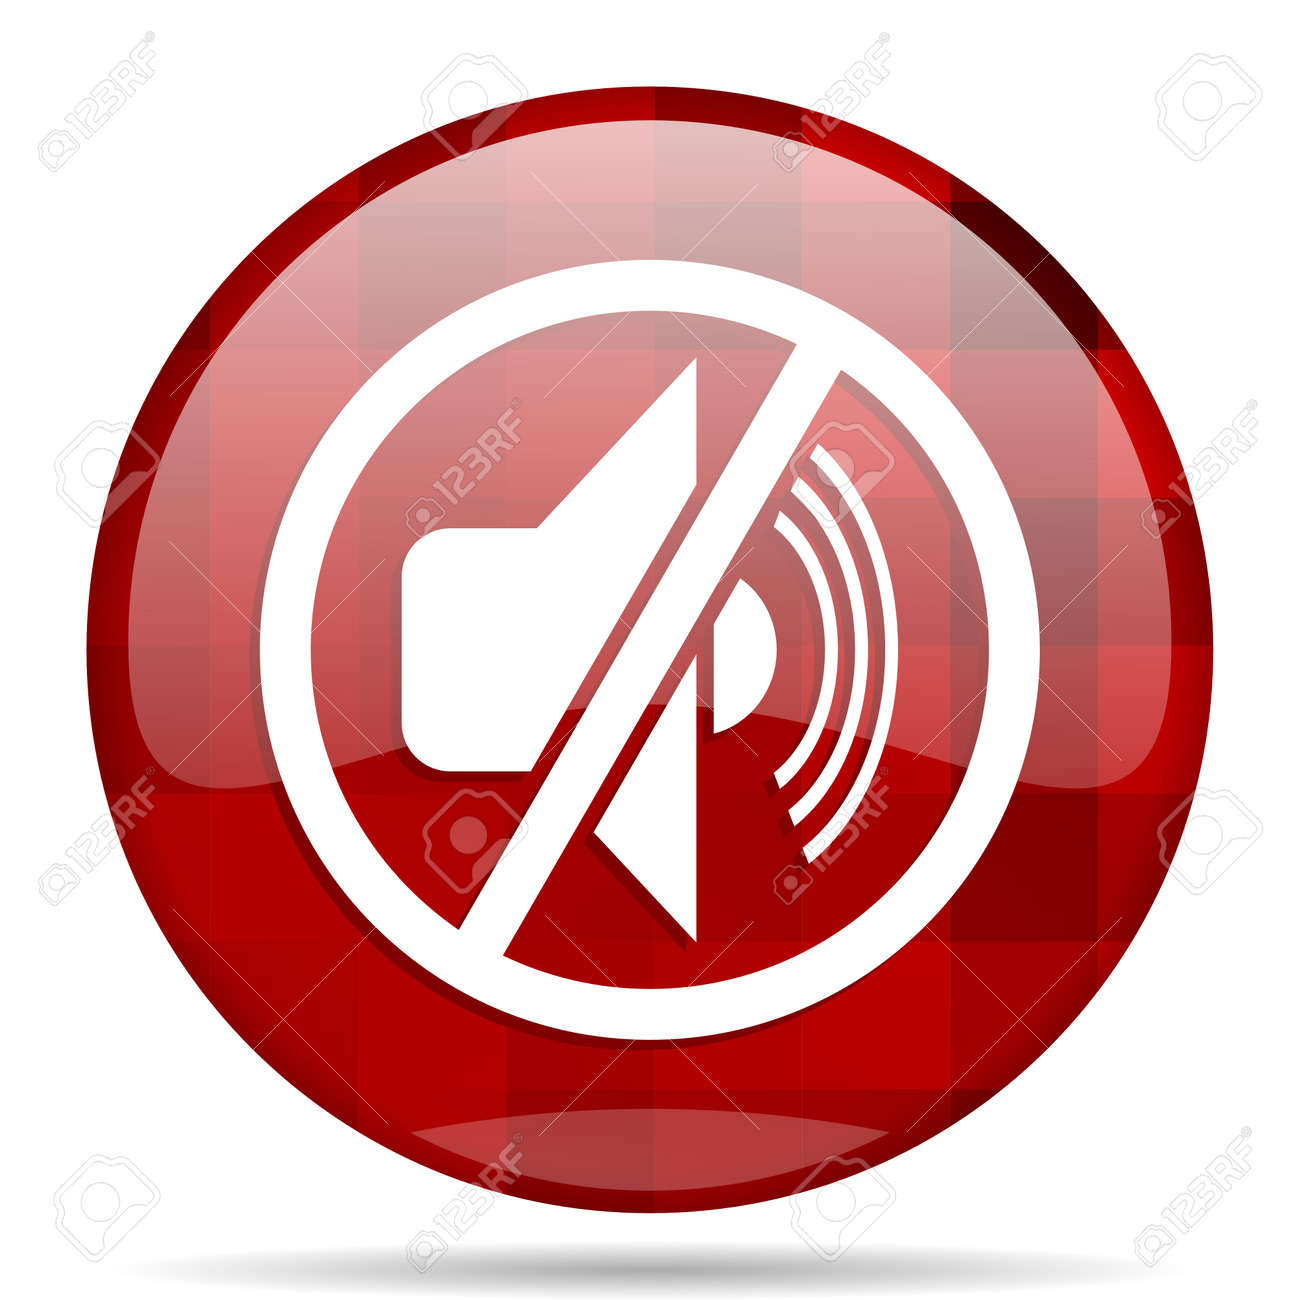 Phone Mute Icon Round Wiring Diagrams 220v3gozonegeneratorozonetubecircuitboard3ghrforwaterplant Red Glossy Modern Design Web Stock Photo Picture Rh 123rf Com Email